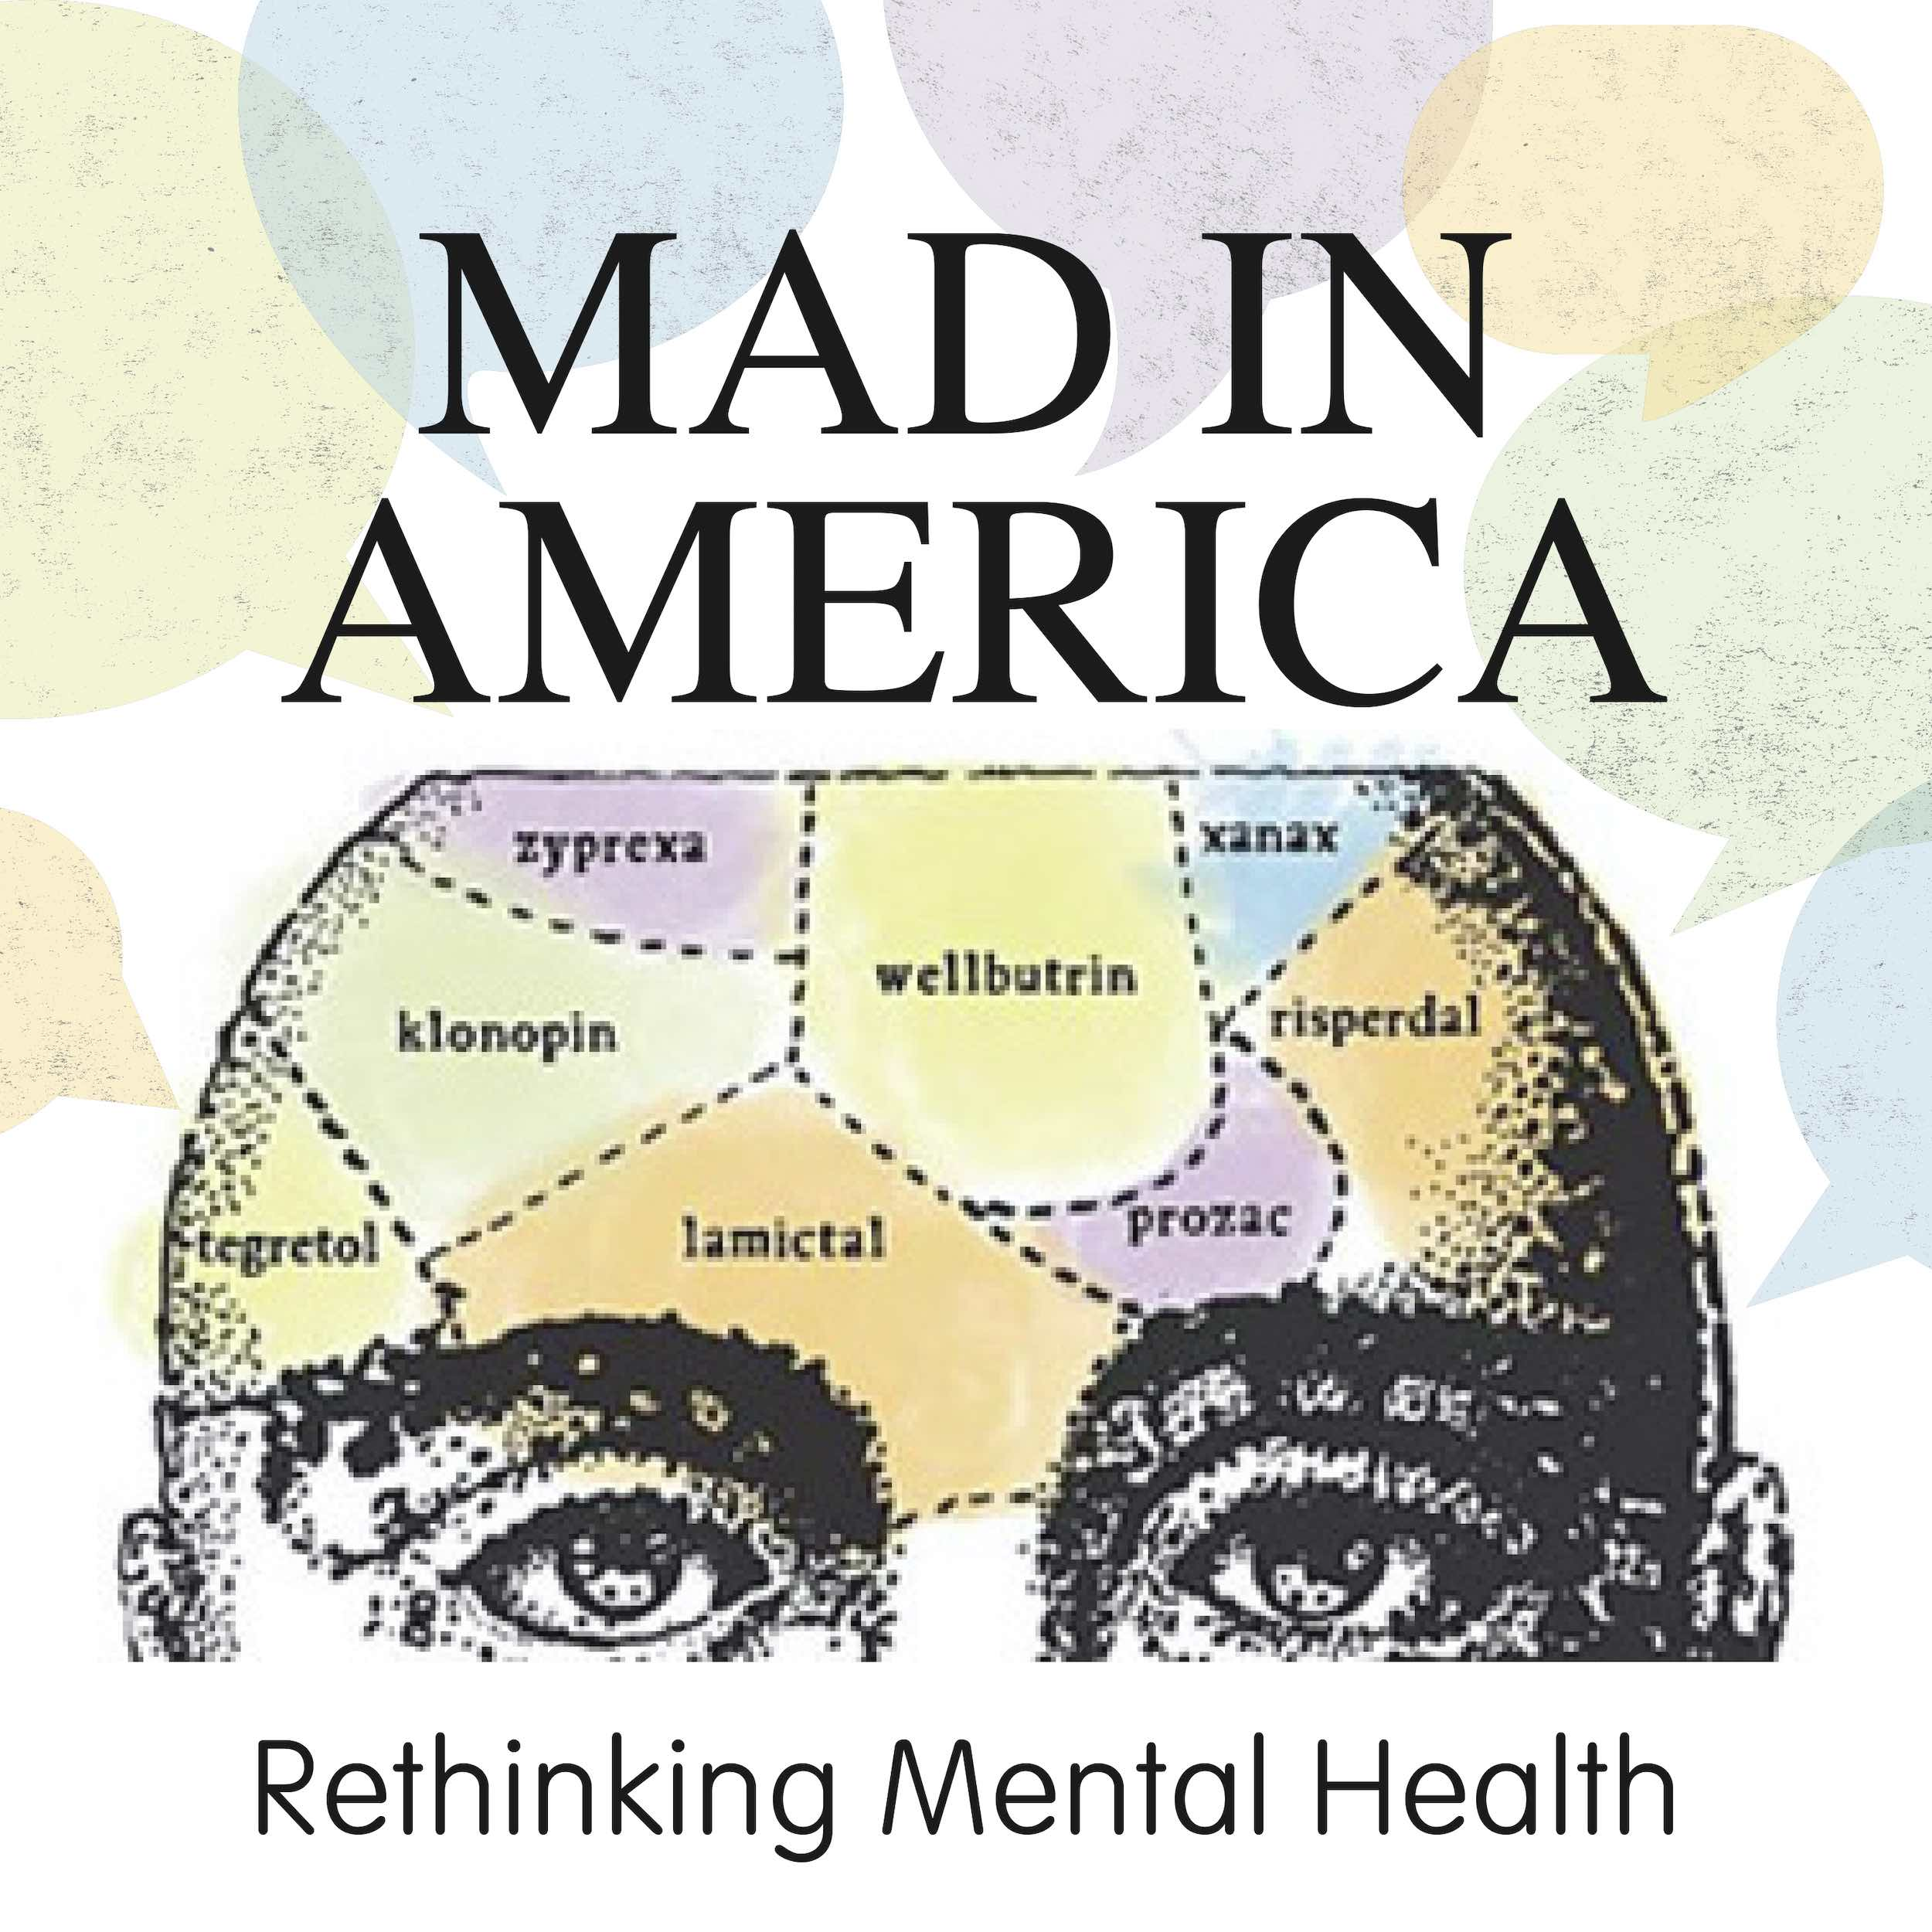 Mad in America: Rethinking Mental Health - Paula Caplan - Listen to a Veteran